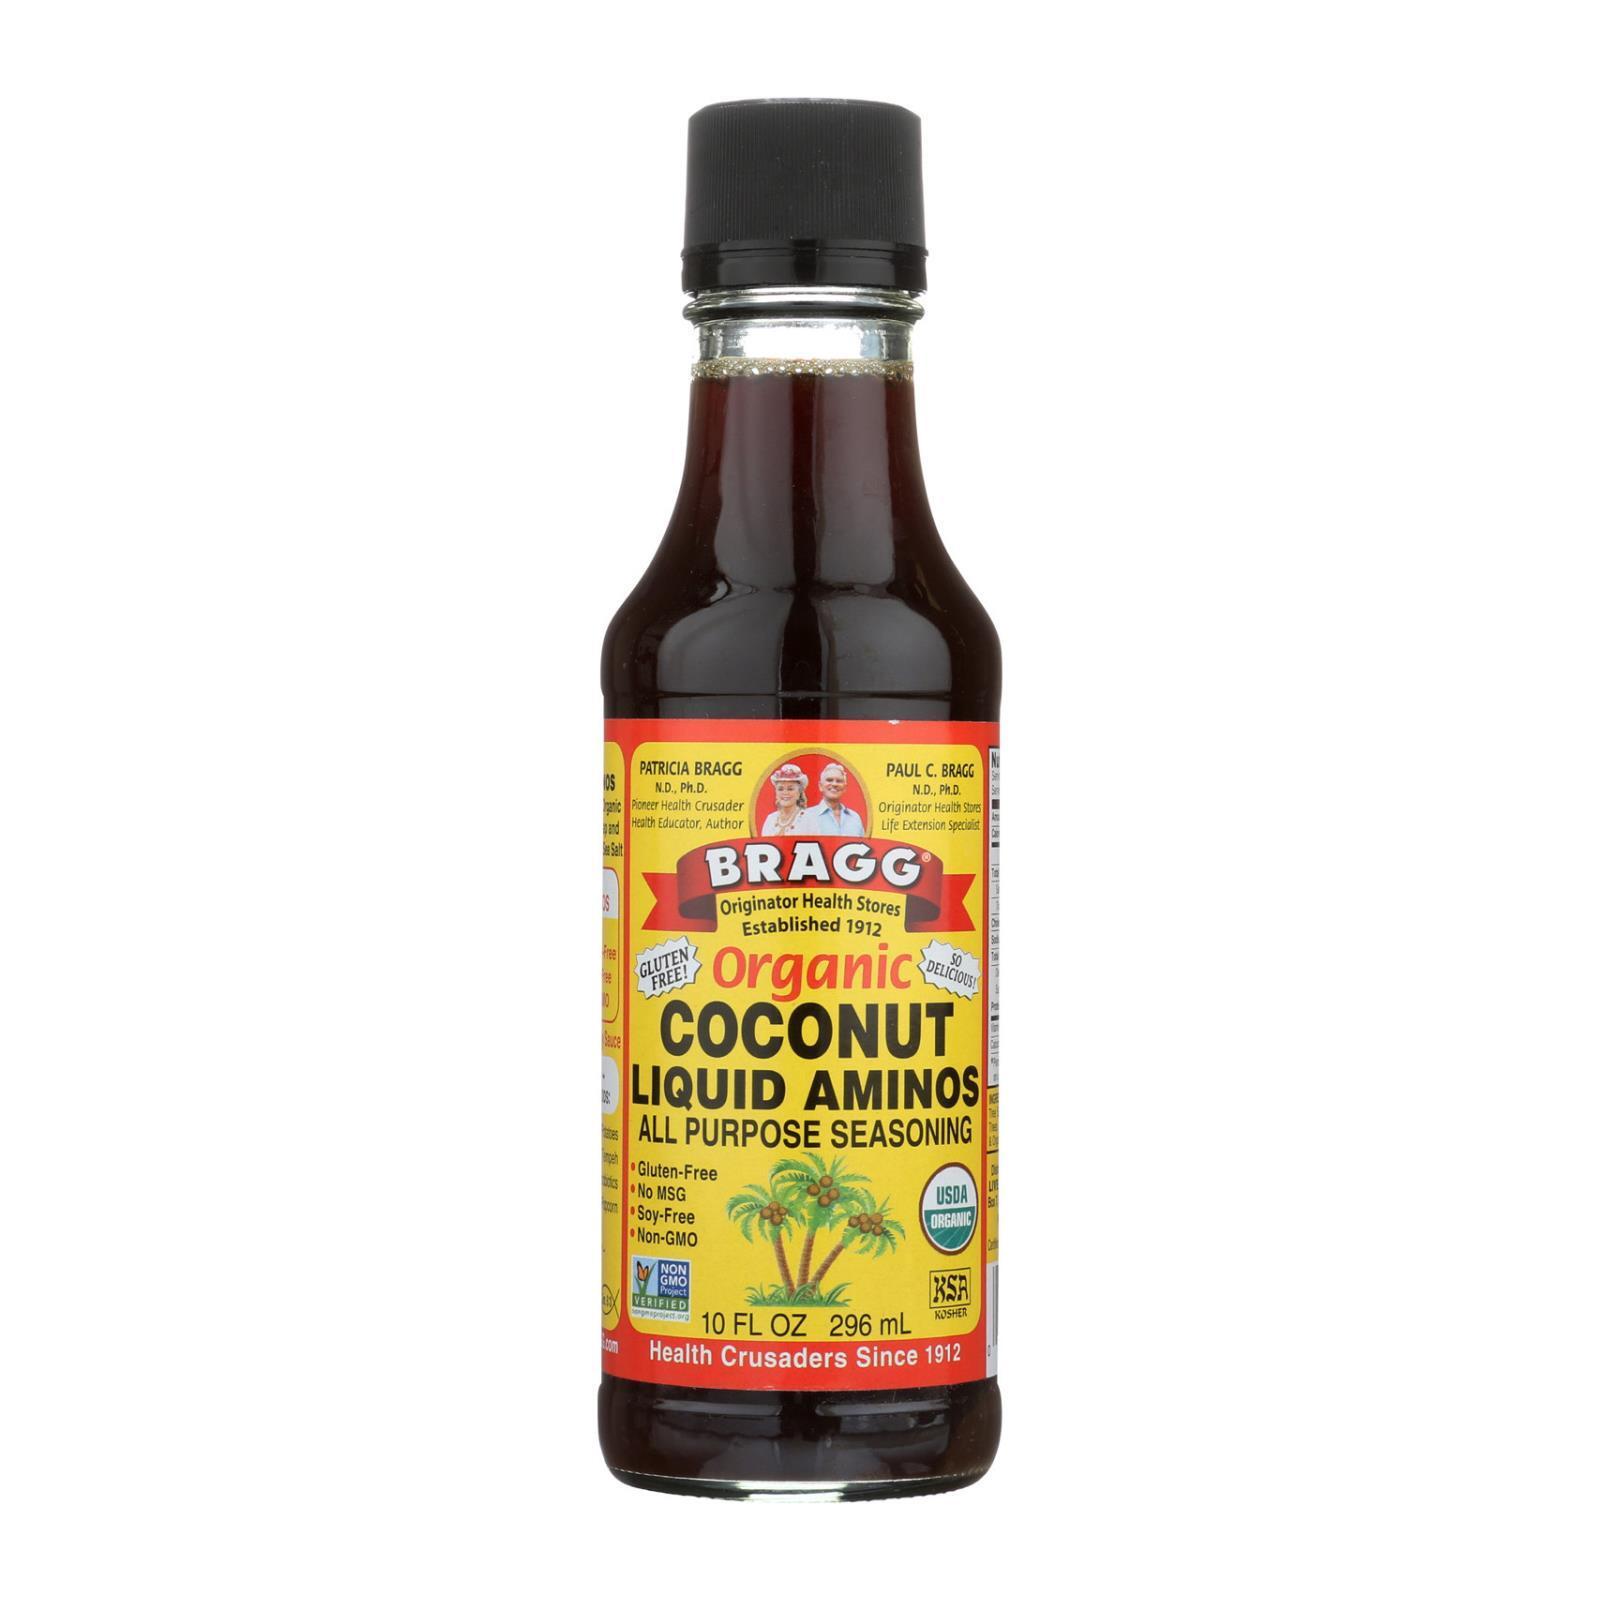 Bragg Liquid Aminos - Organic - Coconut - Case of 12 - 10 fl oz